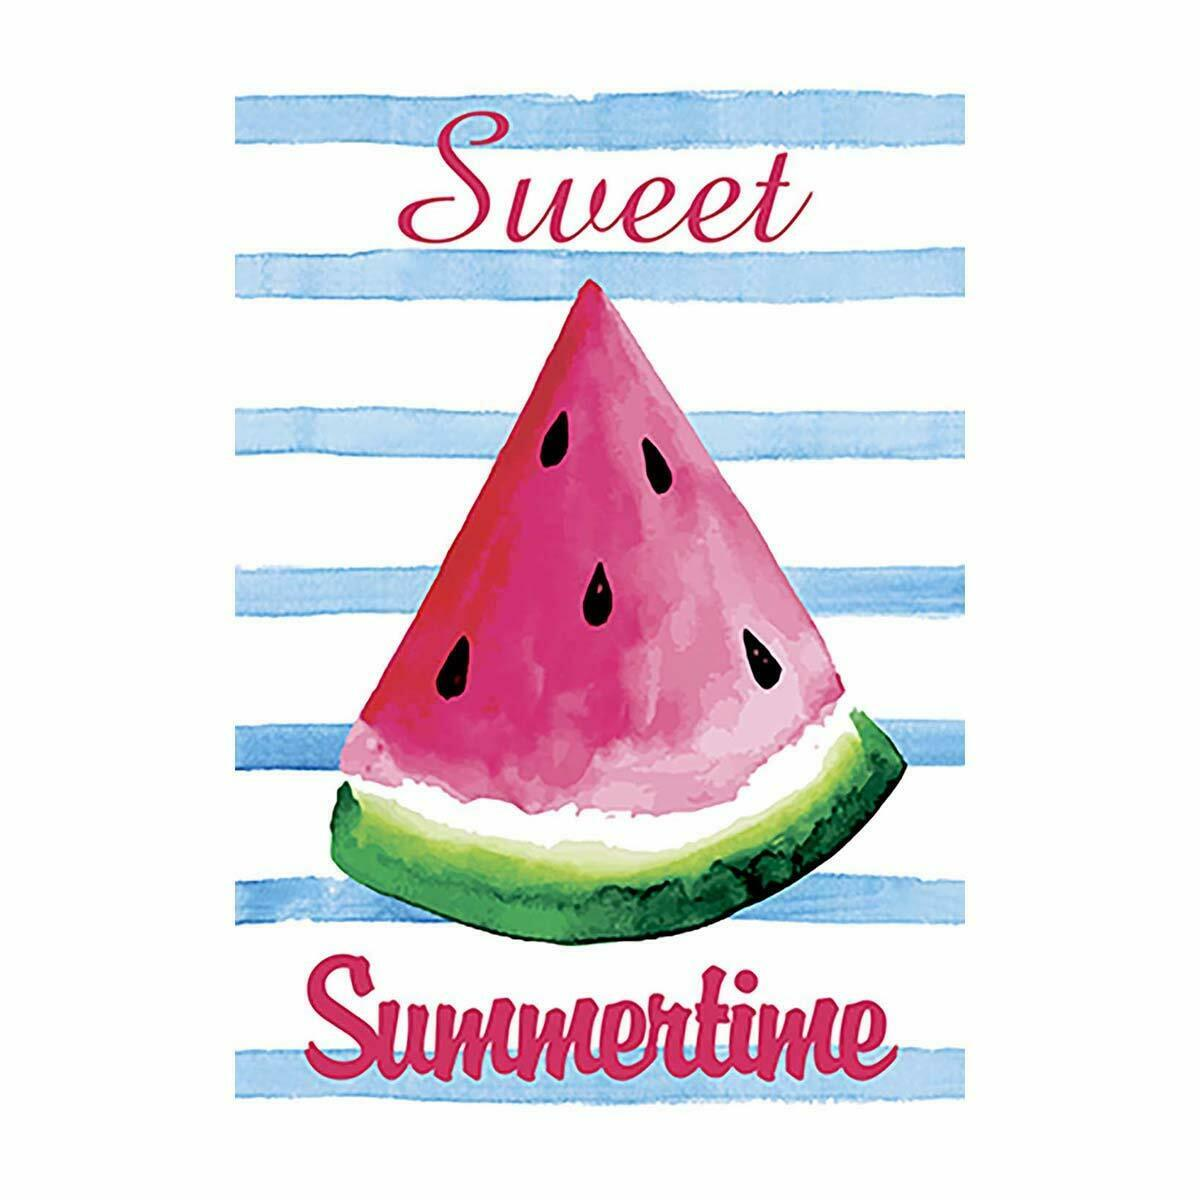 sweet summertime watermelon yard outdoor decorative summer